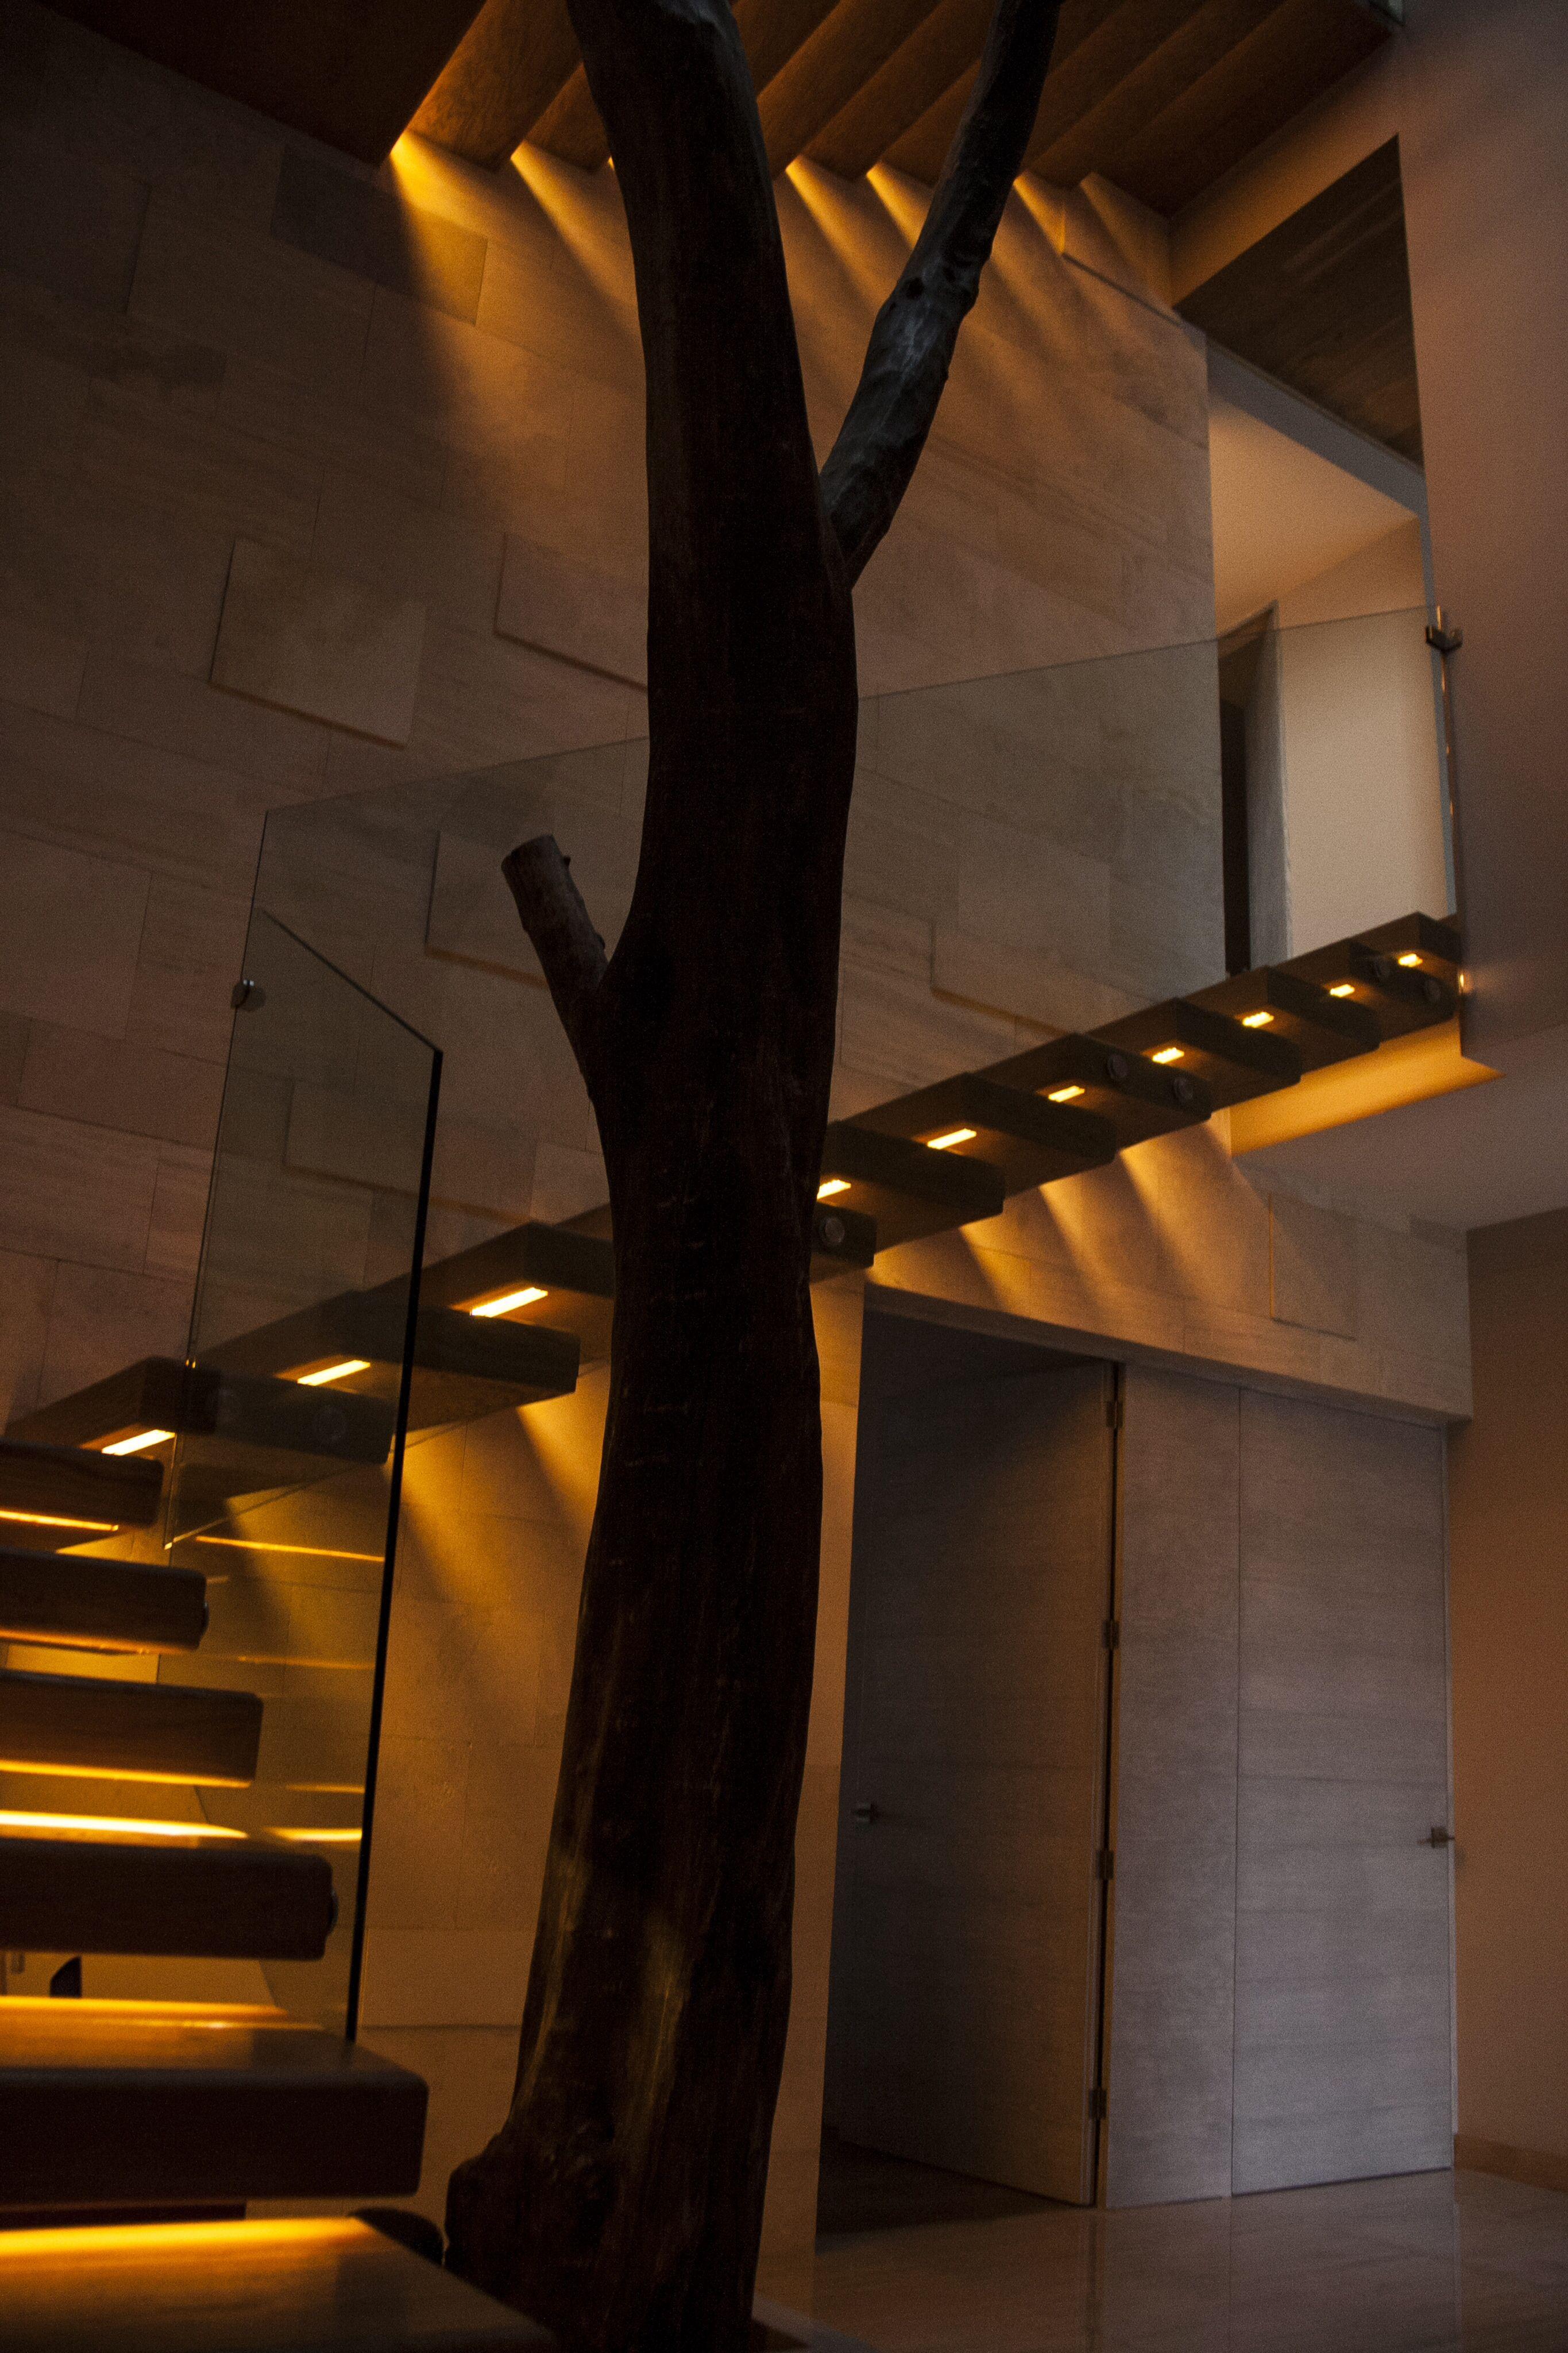 patio interior escalera madera iluminacin indirecta rbol muros de